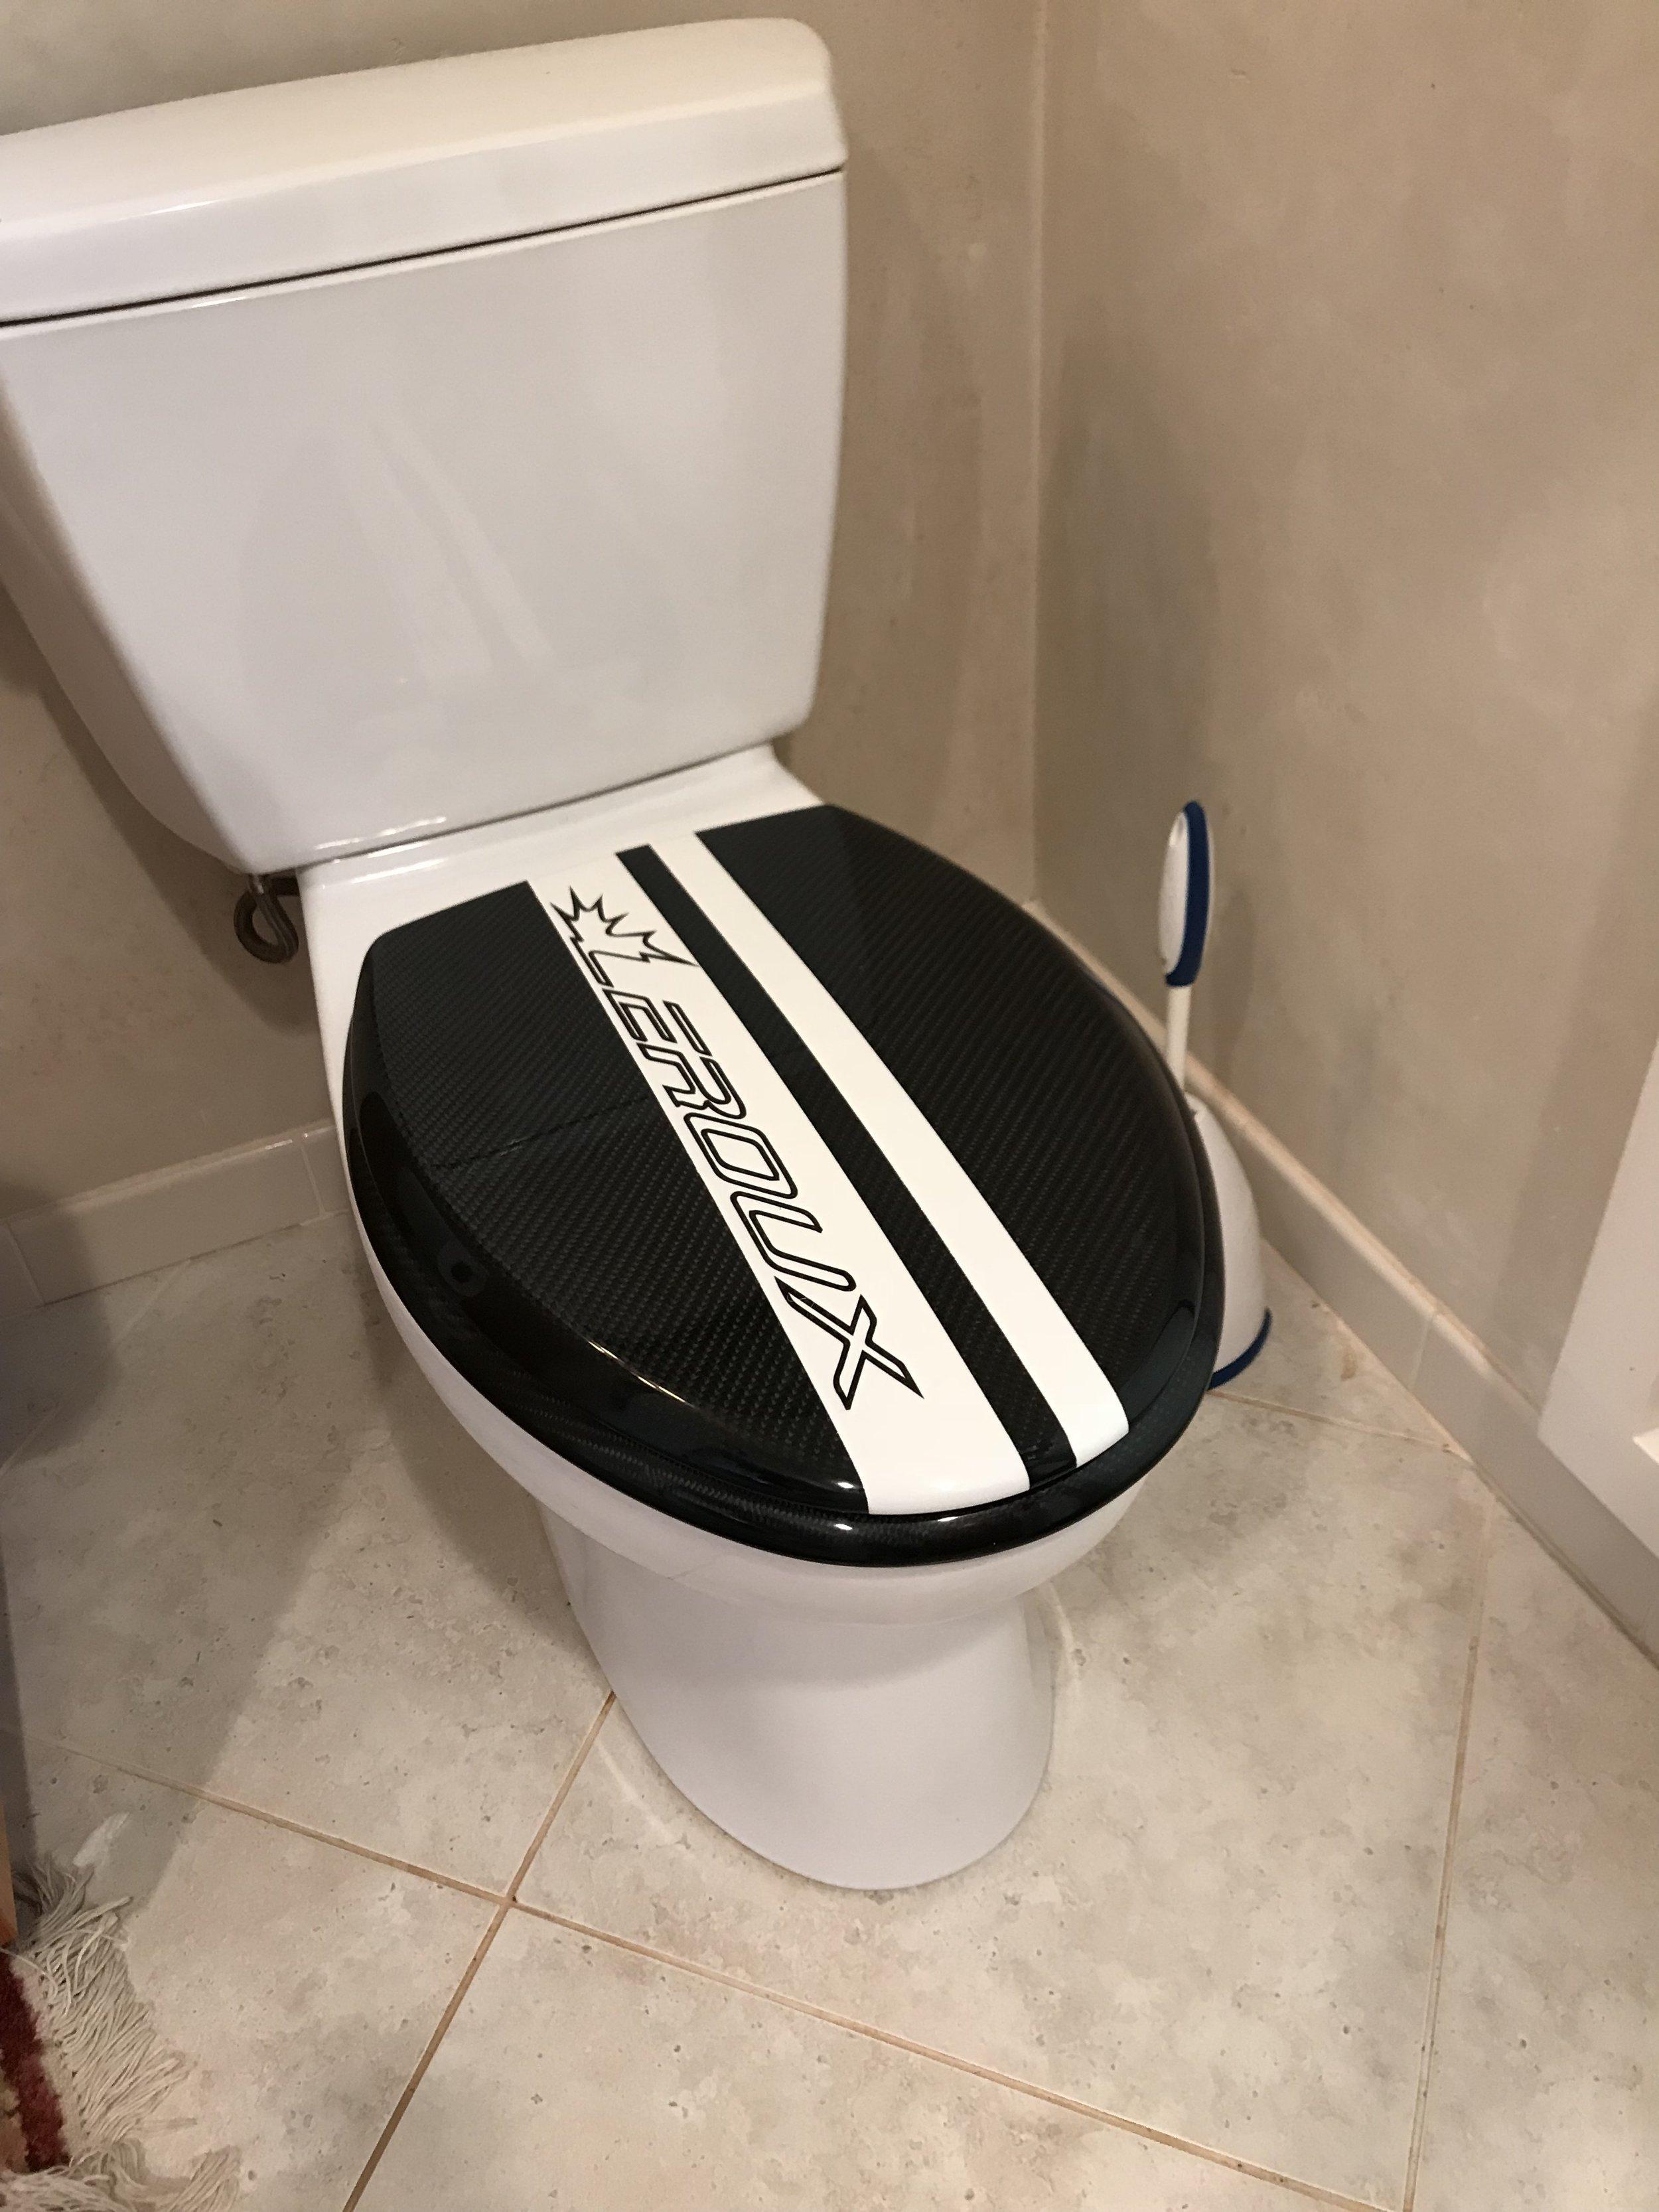 Carbon Toilet Seat!